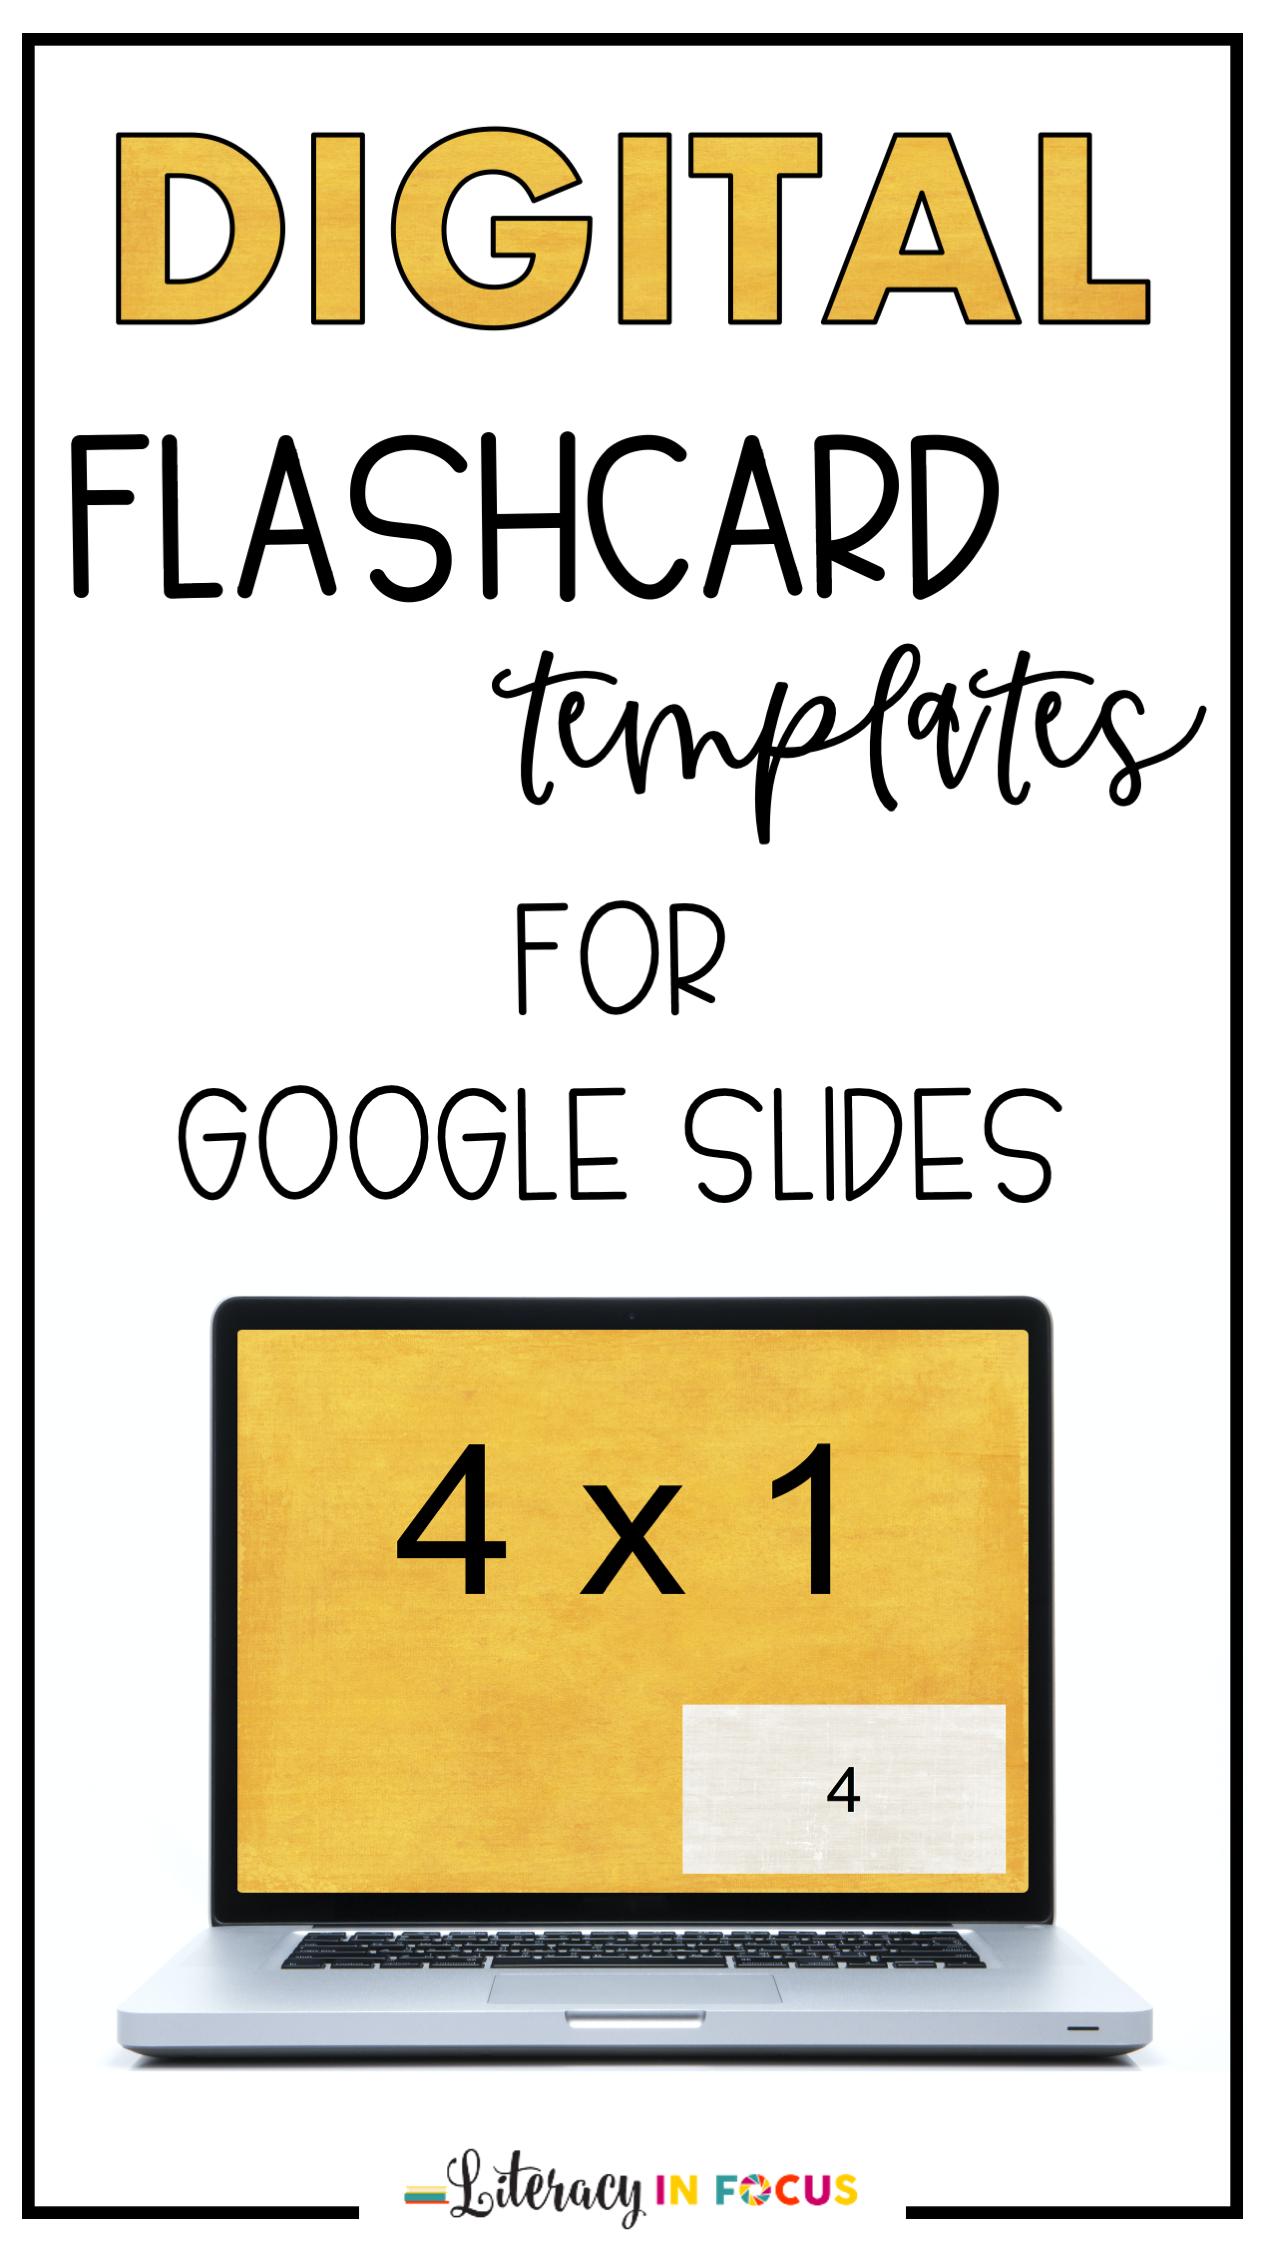 Digital Flashcard Templates For Google Slides In 2020